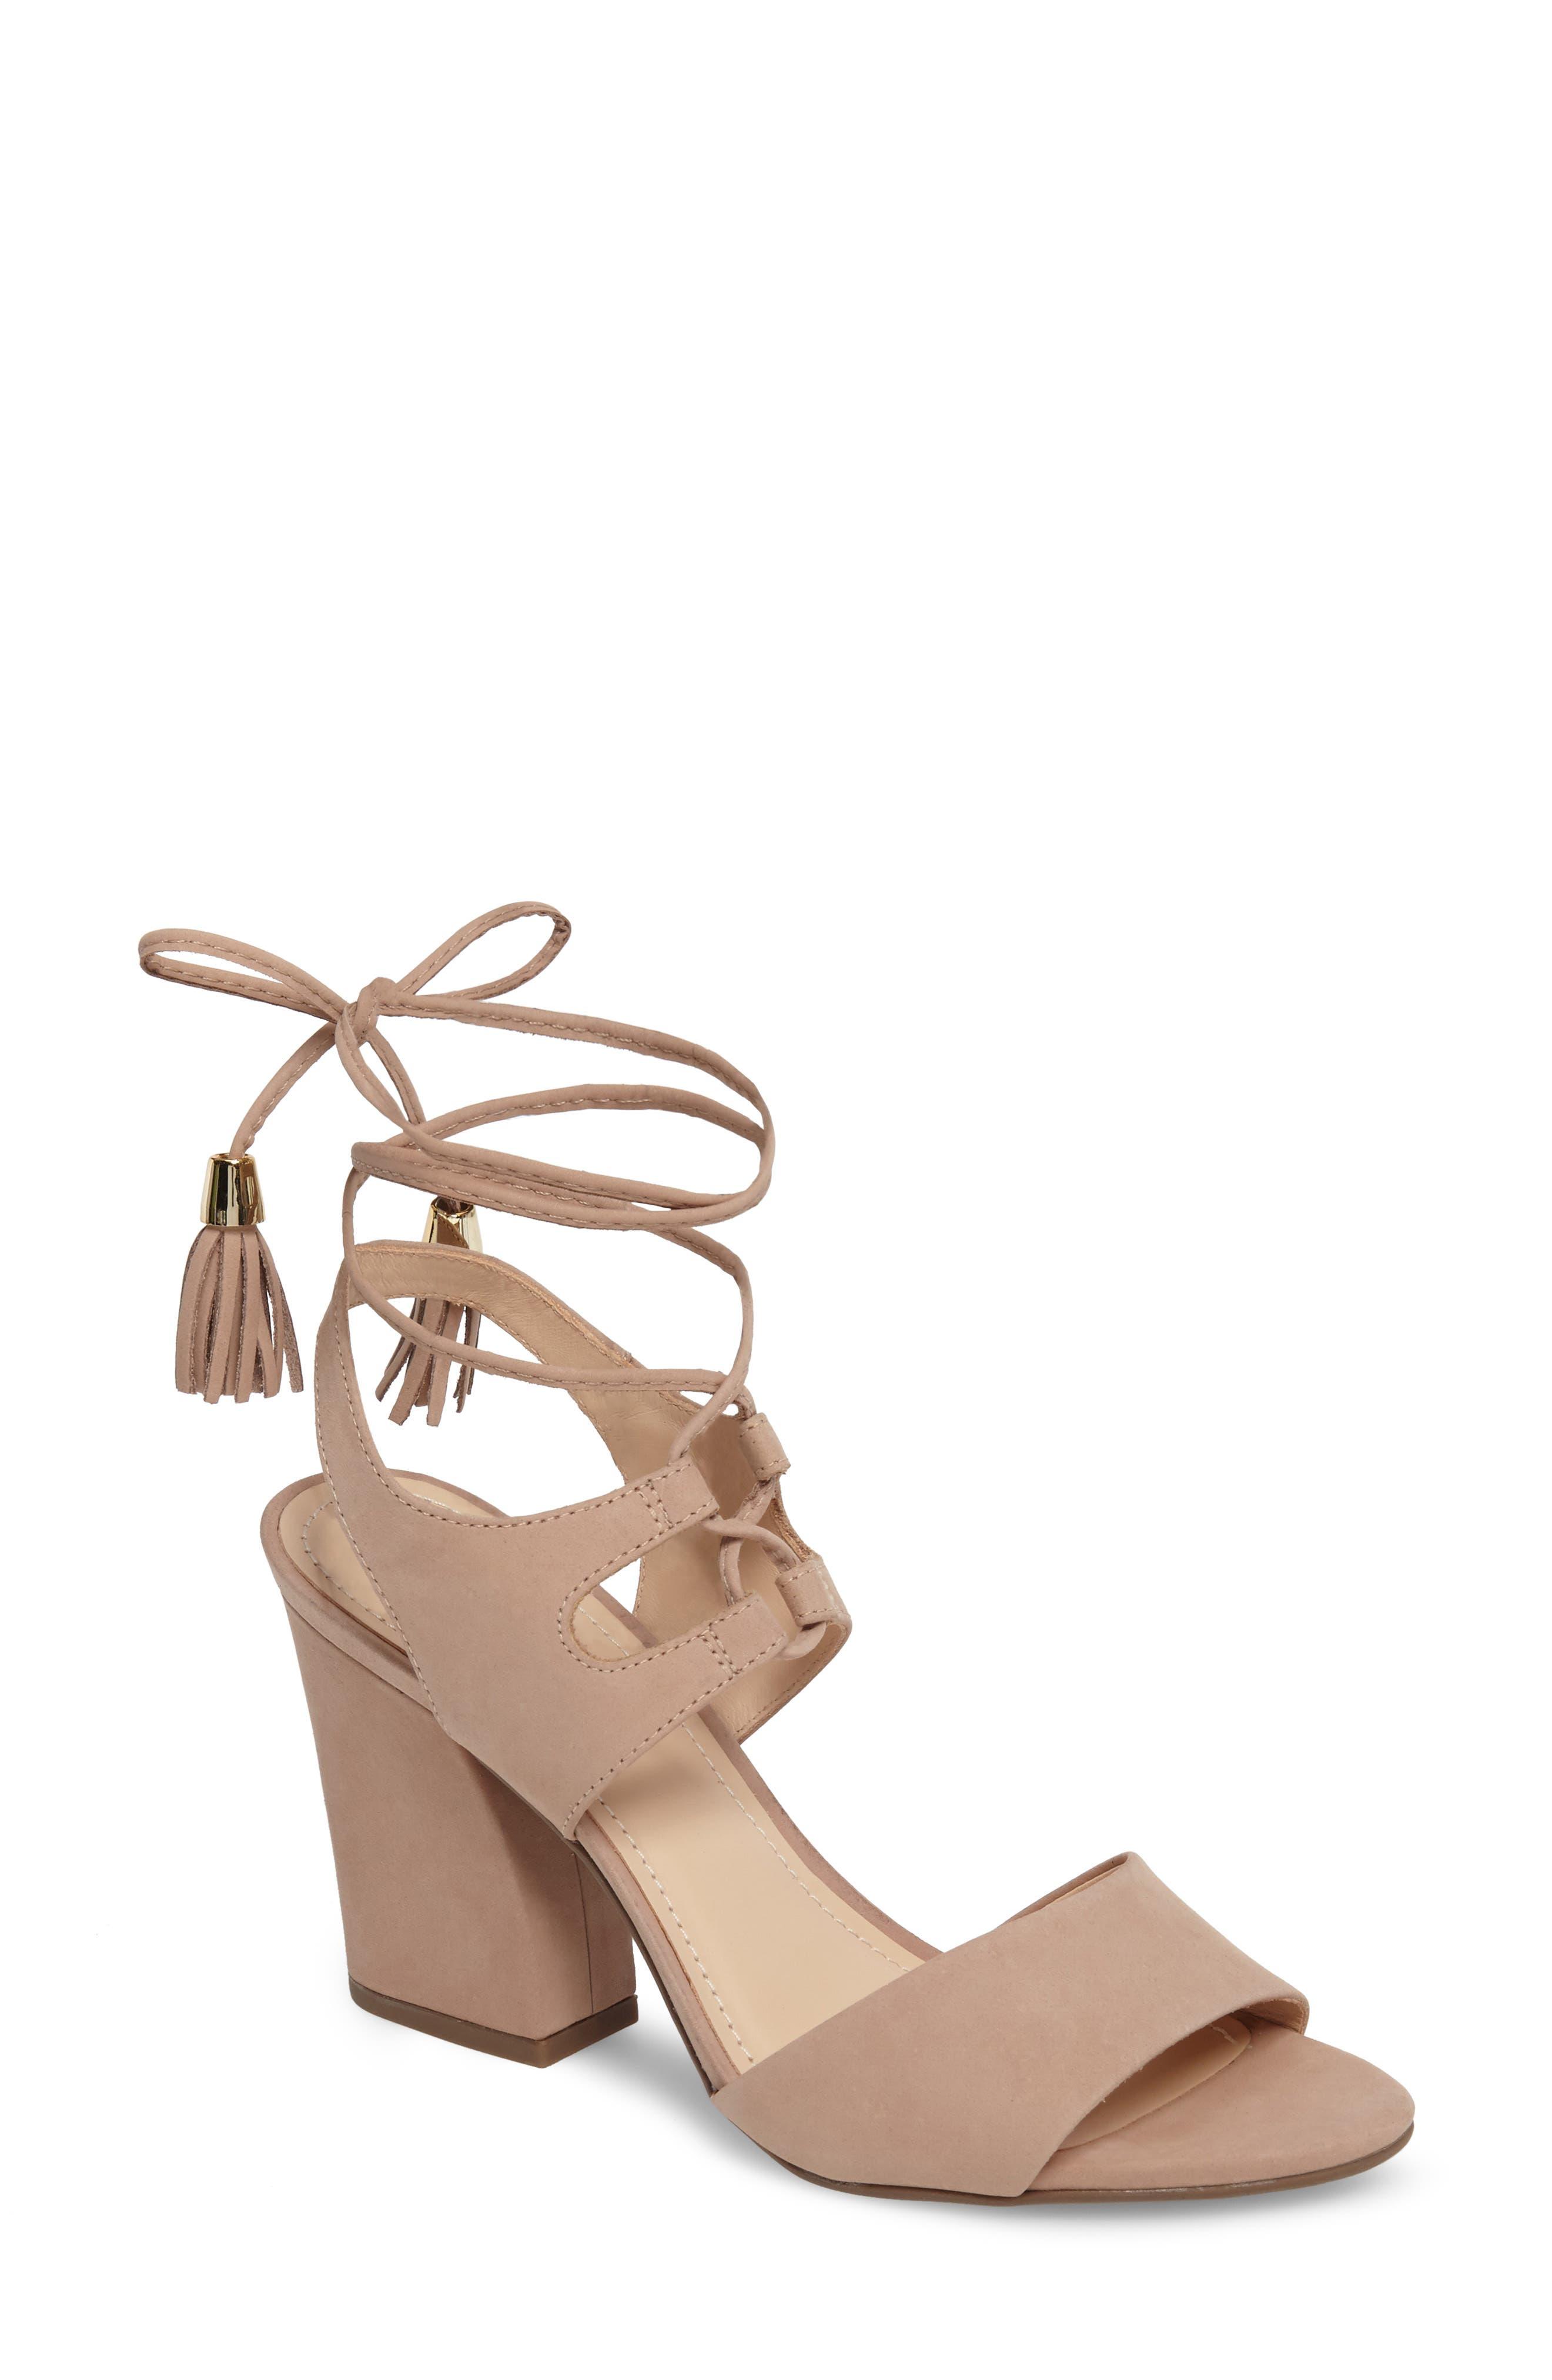 Alternate Image 1 Selected - Klub Nico Kaira Ankle Wrap Sandal (Women)